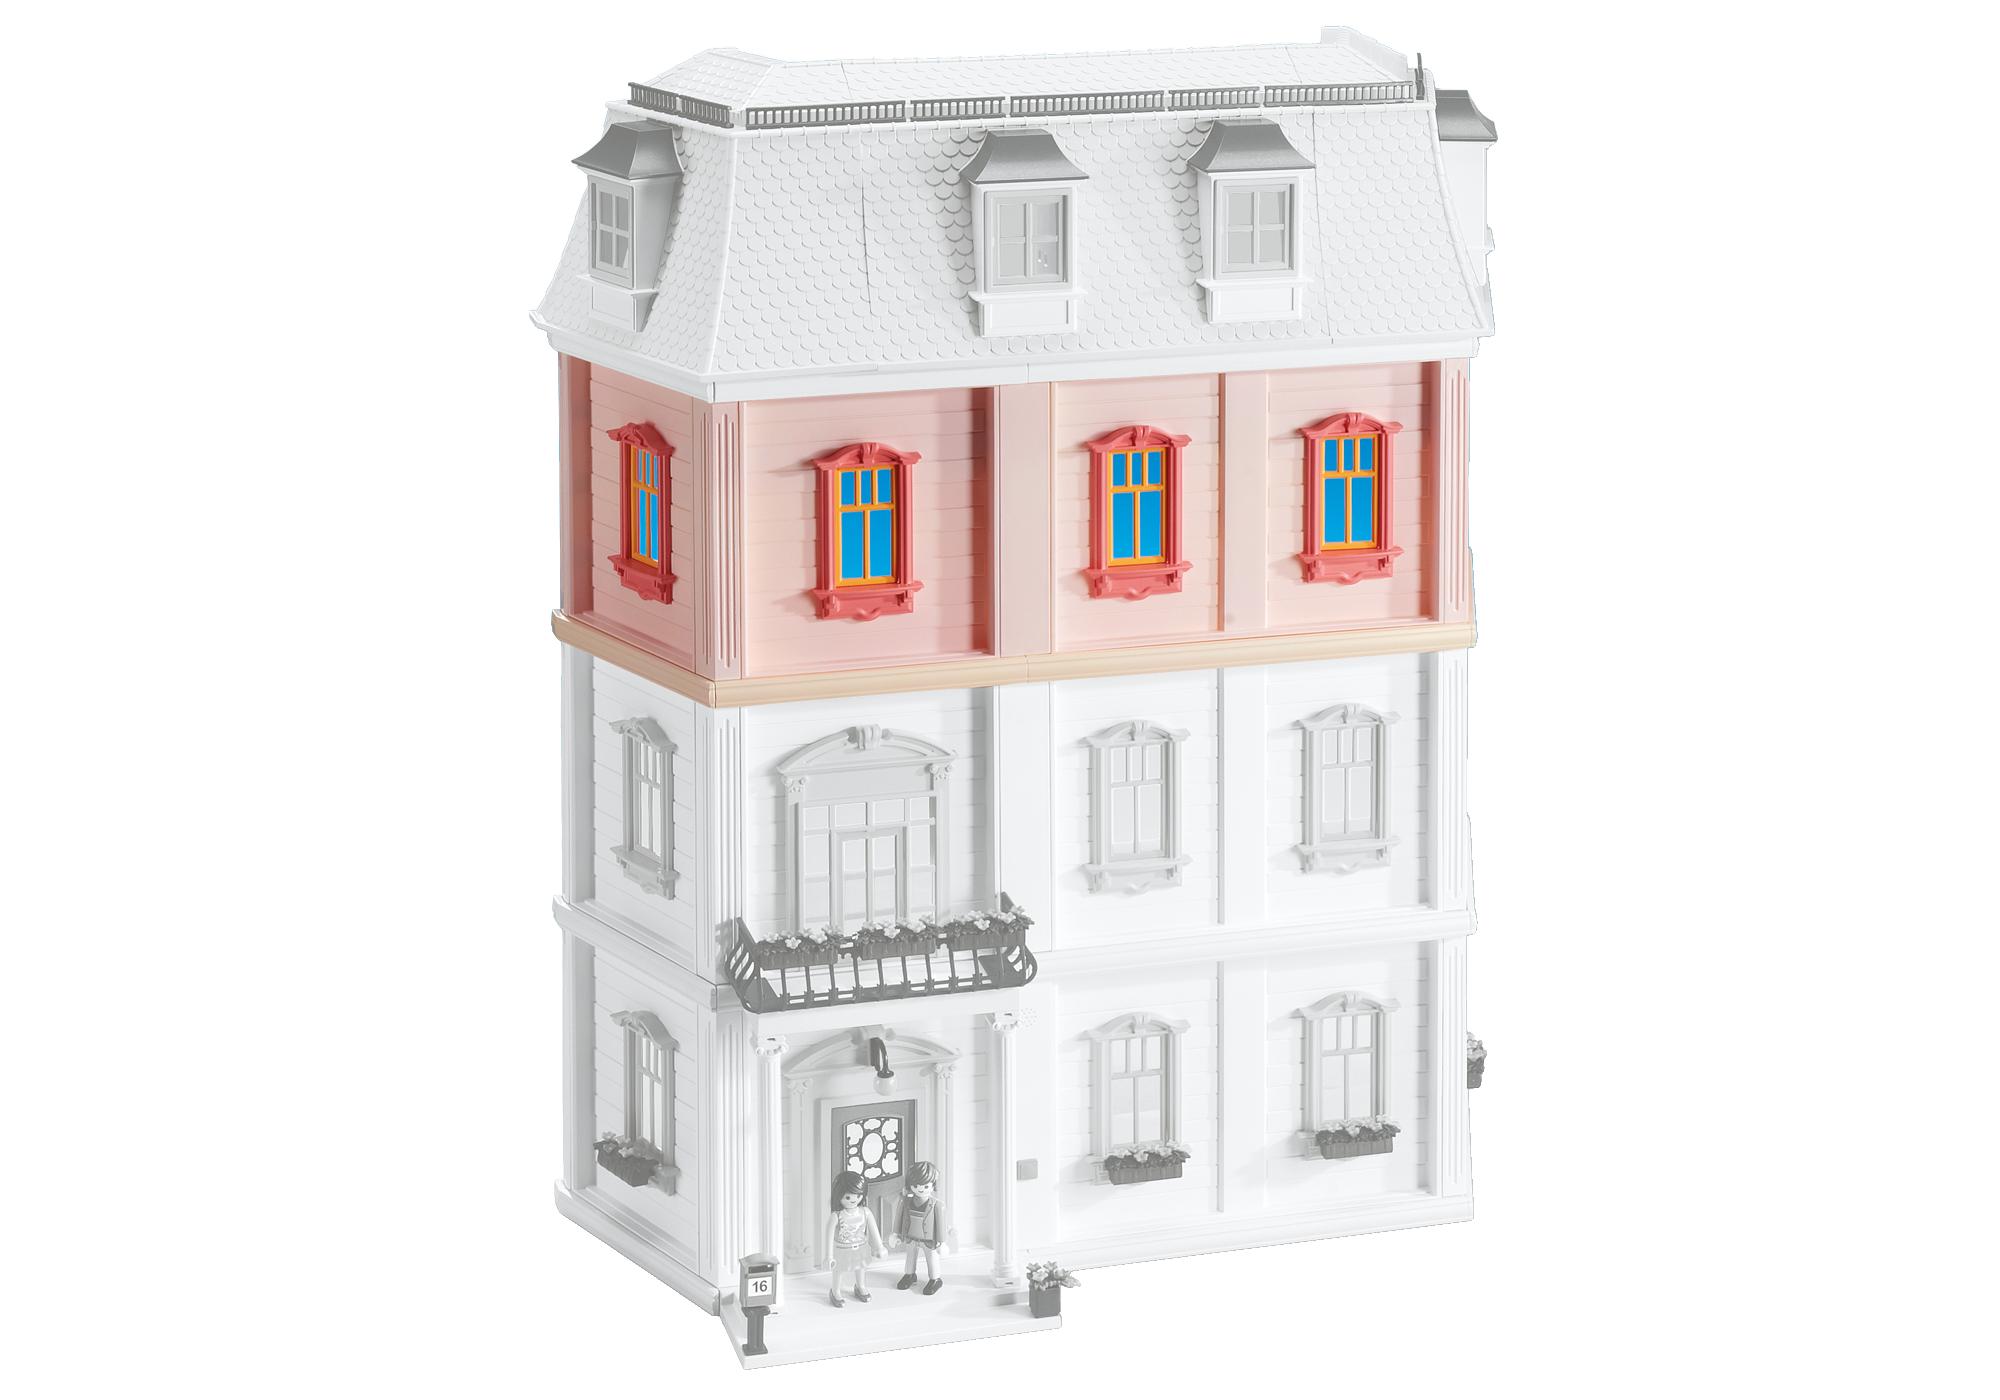 http://media.playmobil.com/i/playmobil/6453_product_detail/Extensión B para la Casa de Muñecas Romántica (ref. 5303)